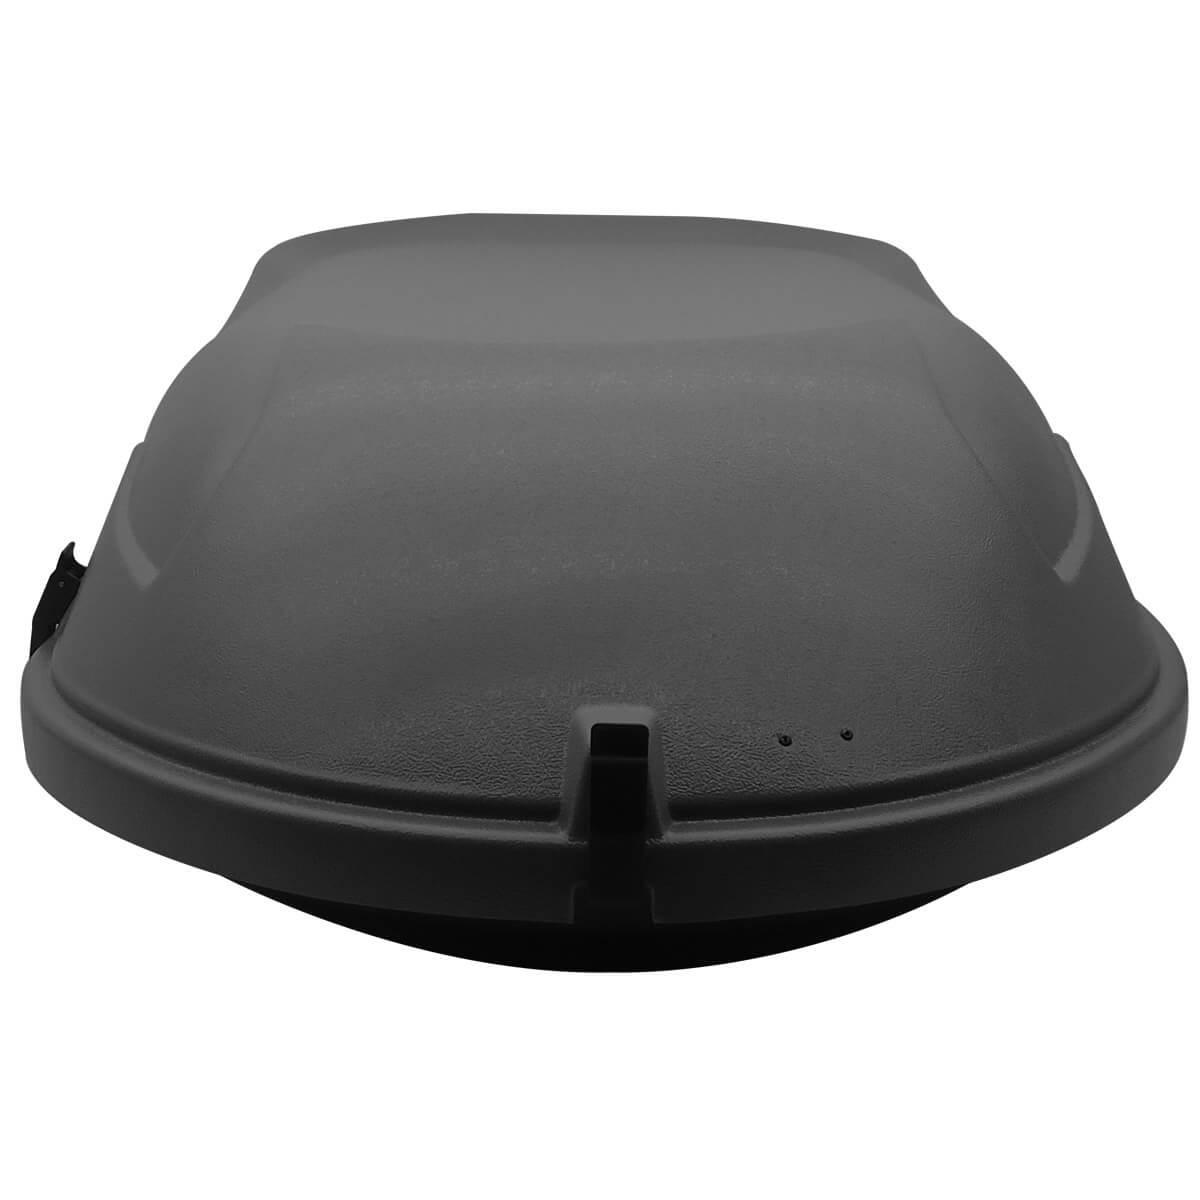 Bagageiro de teto maleiro com chave Motobul 400 litros cinza